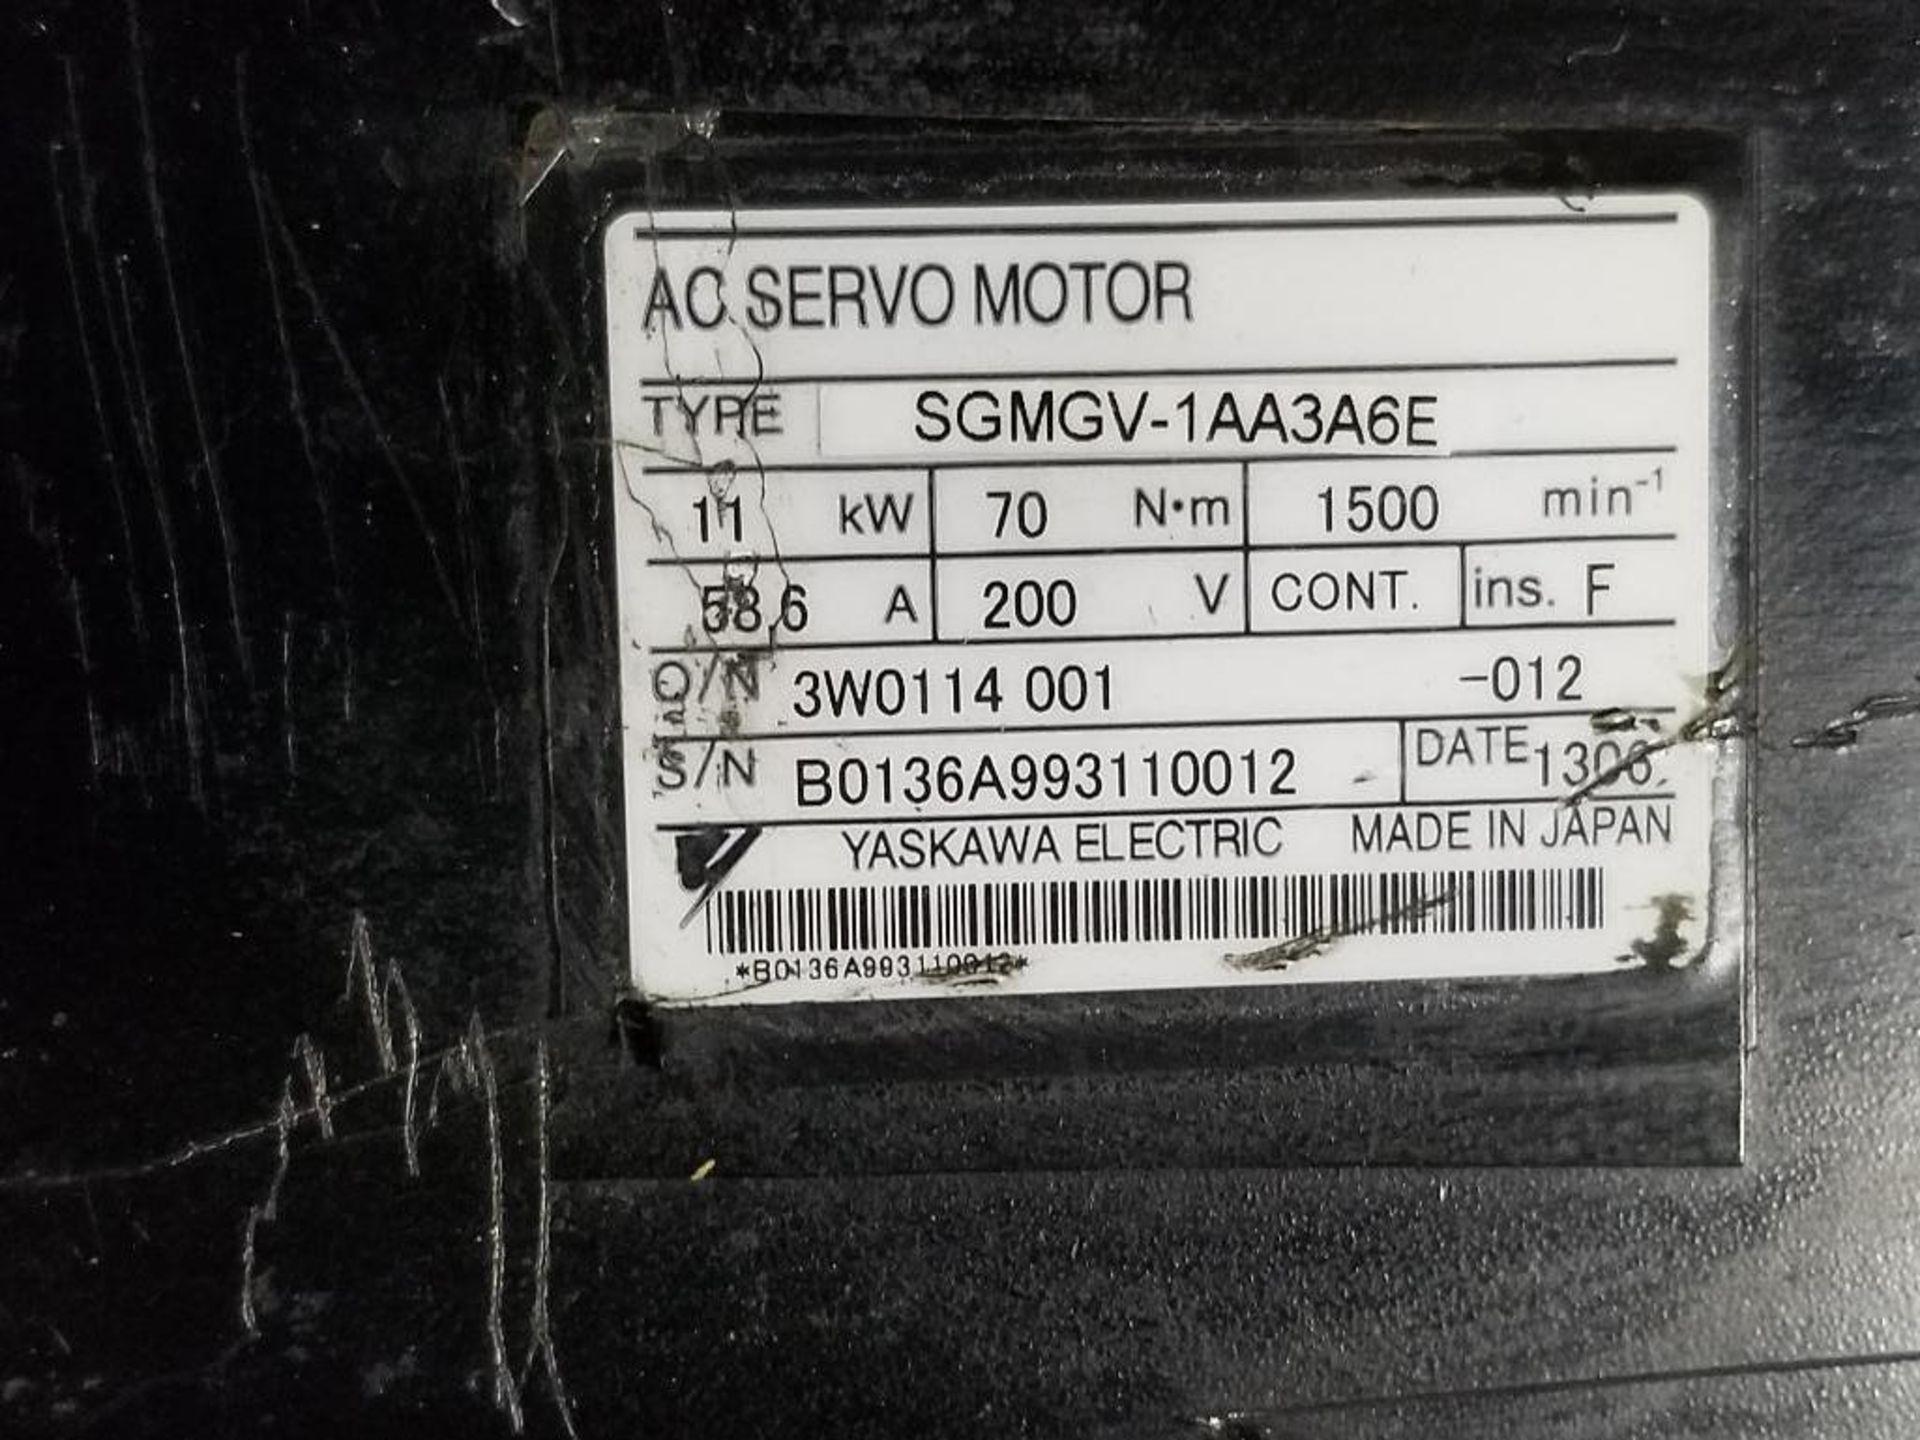 11kW Yaskawa Electric AC Servo Motor. SGMGV-1AA3A6E. 200V, 1500RPM. - Image 3 of 5